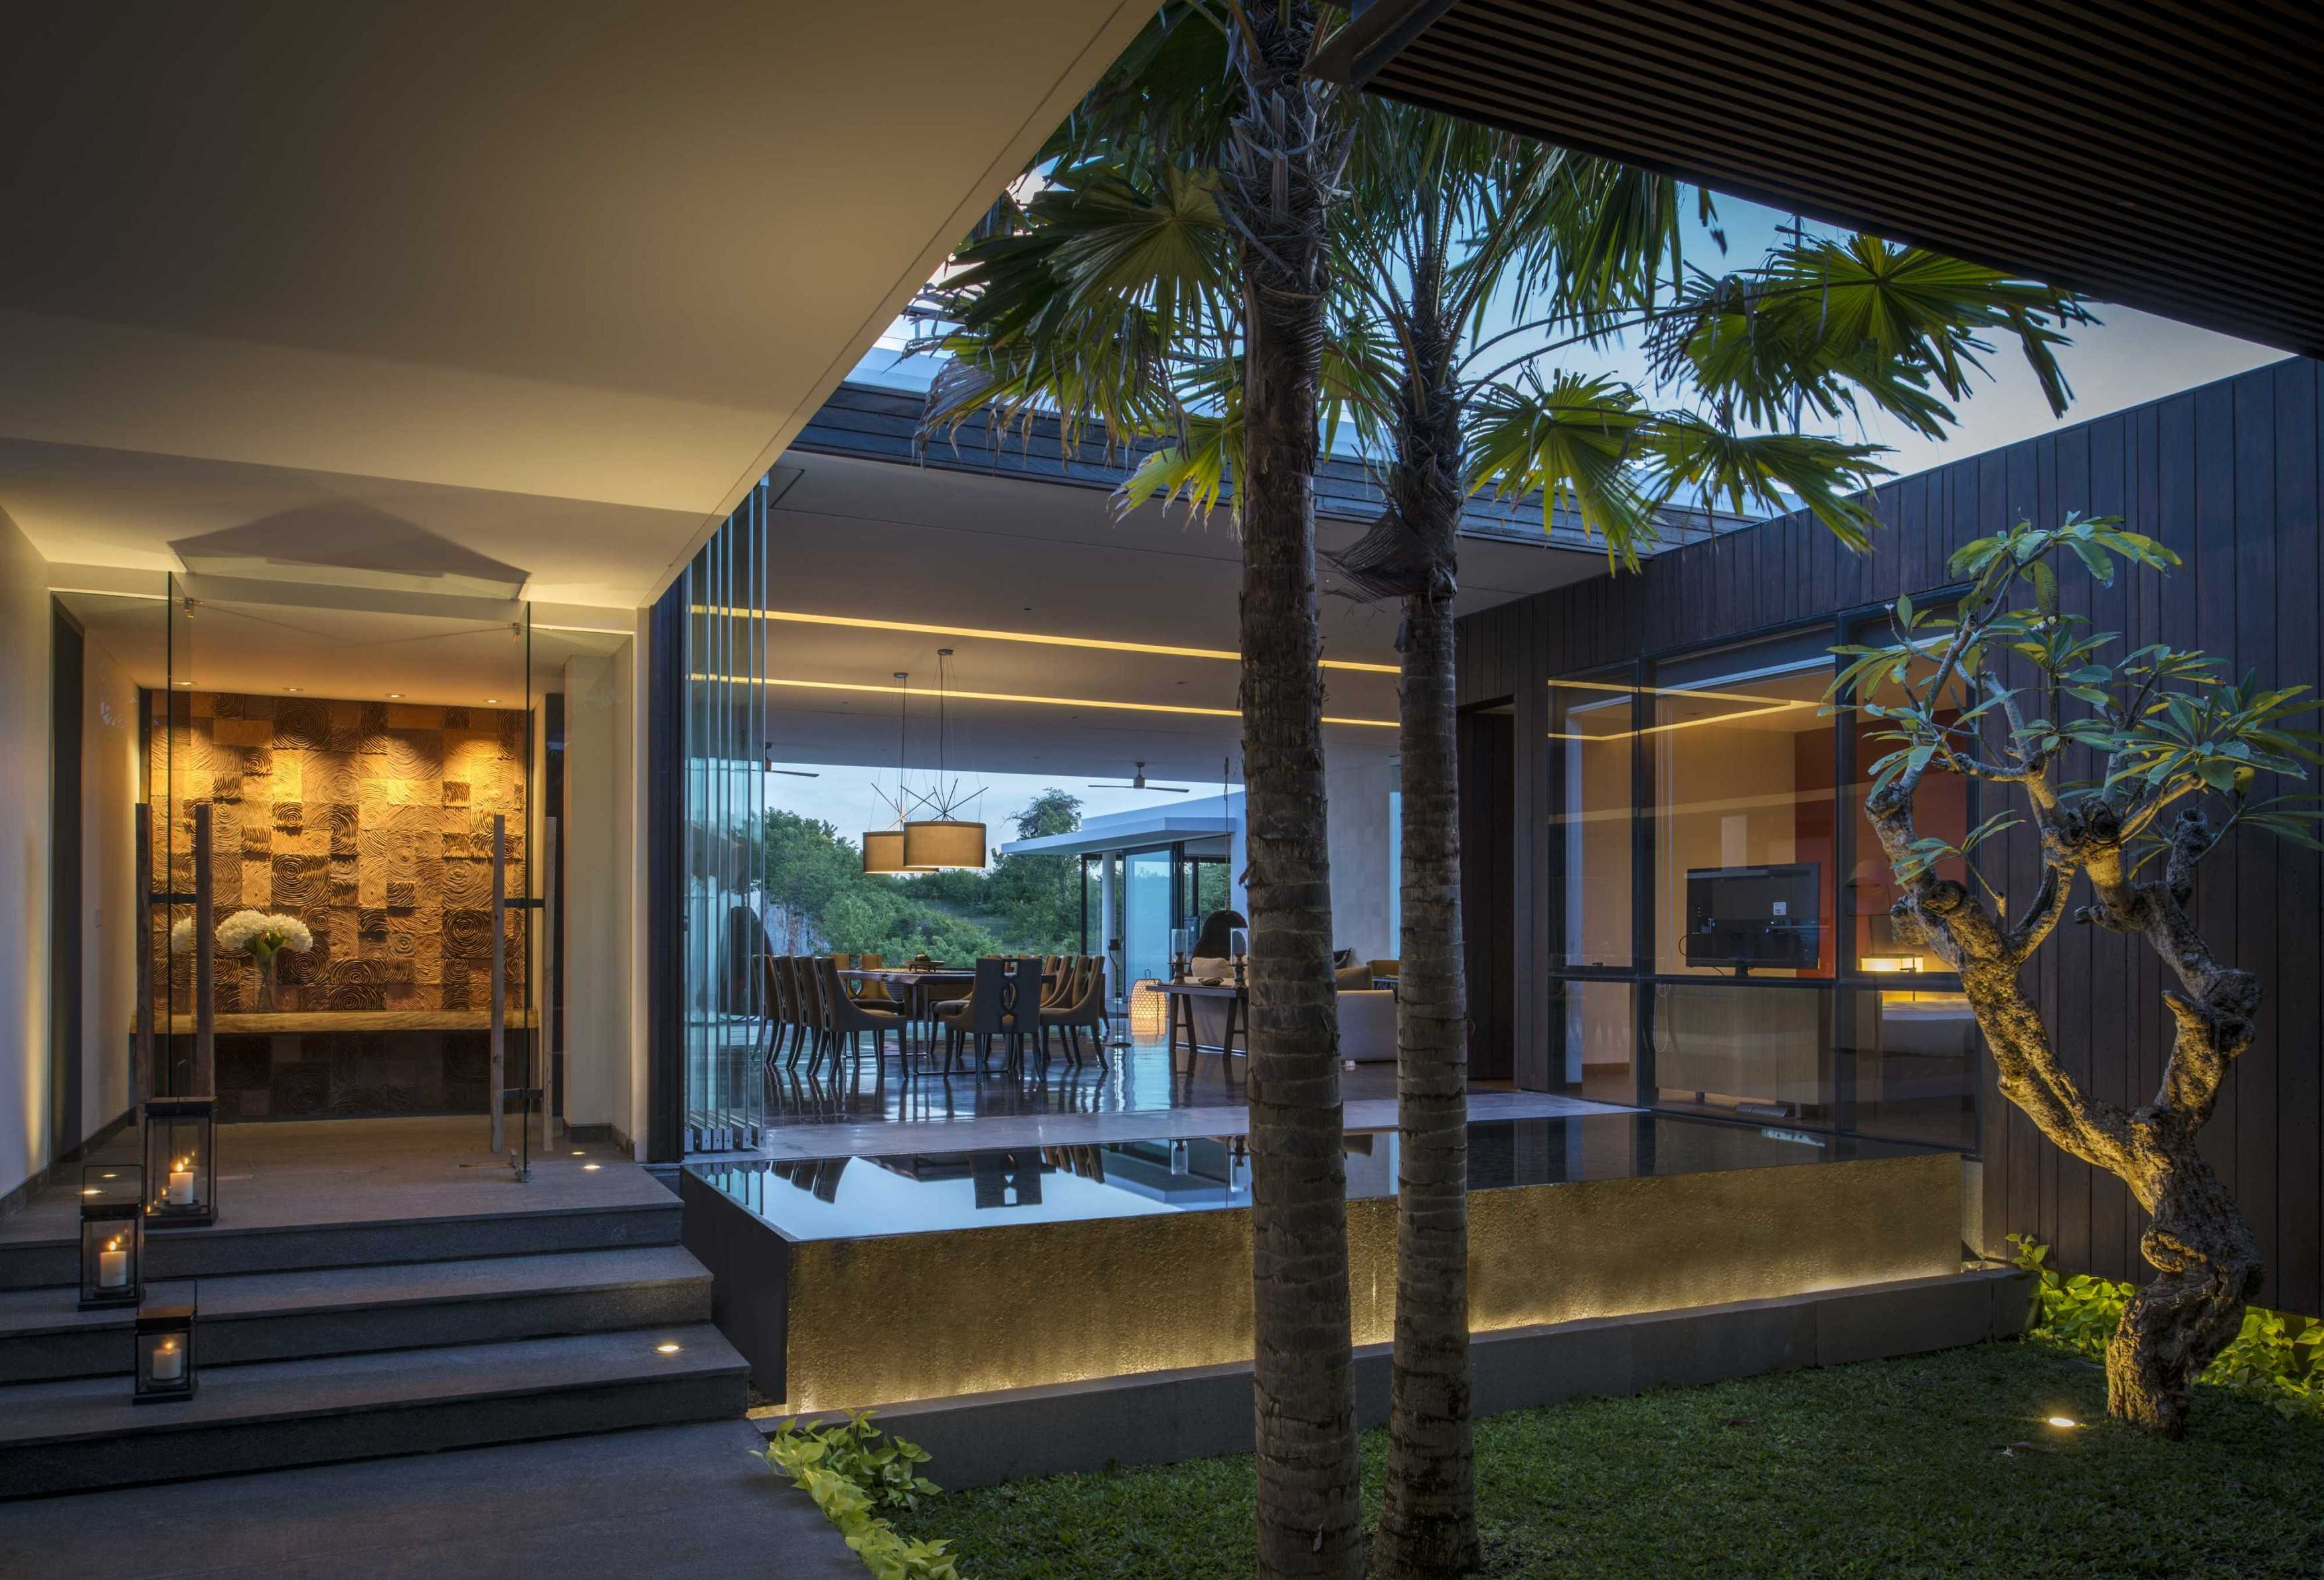 Parametr Indonesia Villa Wrk  Kutuh, Bali Kutuh, Bali Pond   15184